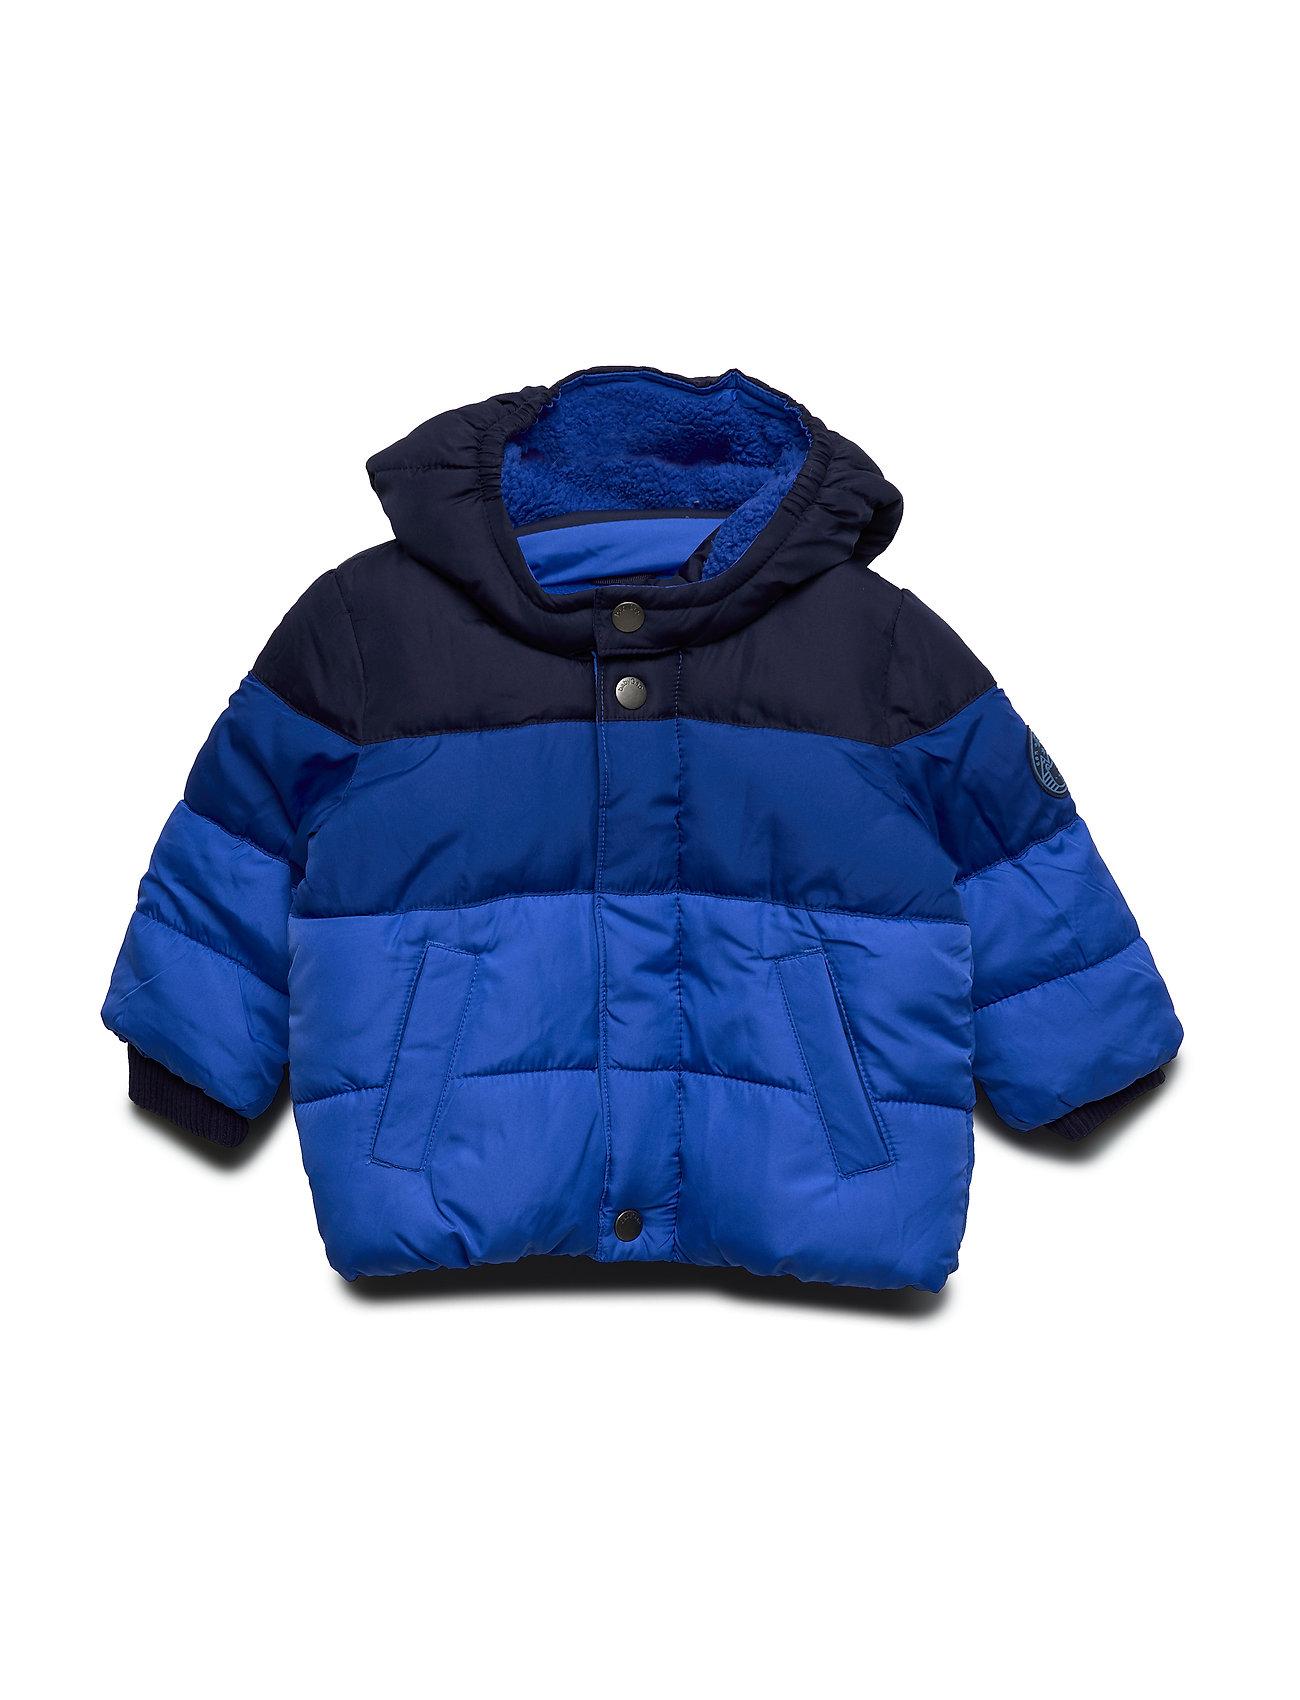 GAP WARMEST JACKET - RADIANT BLUE